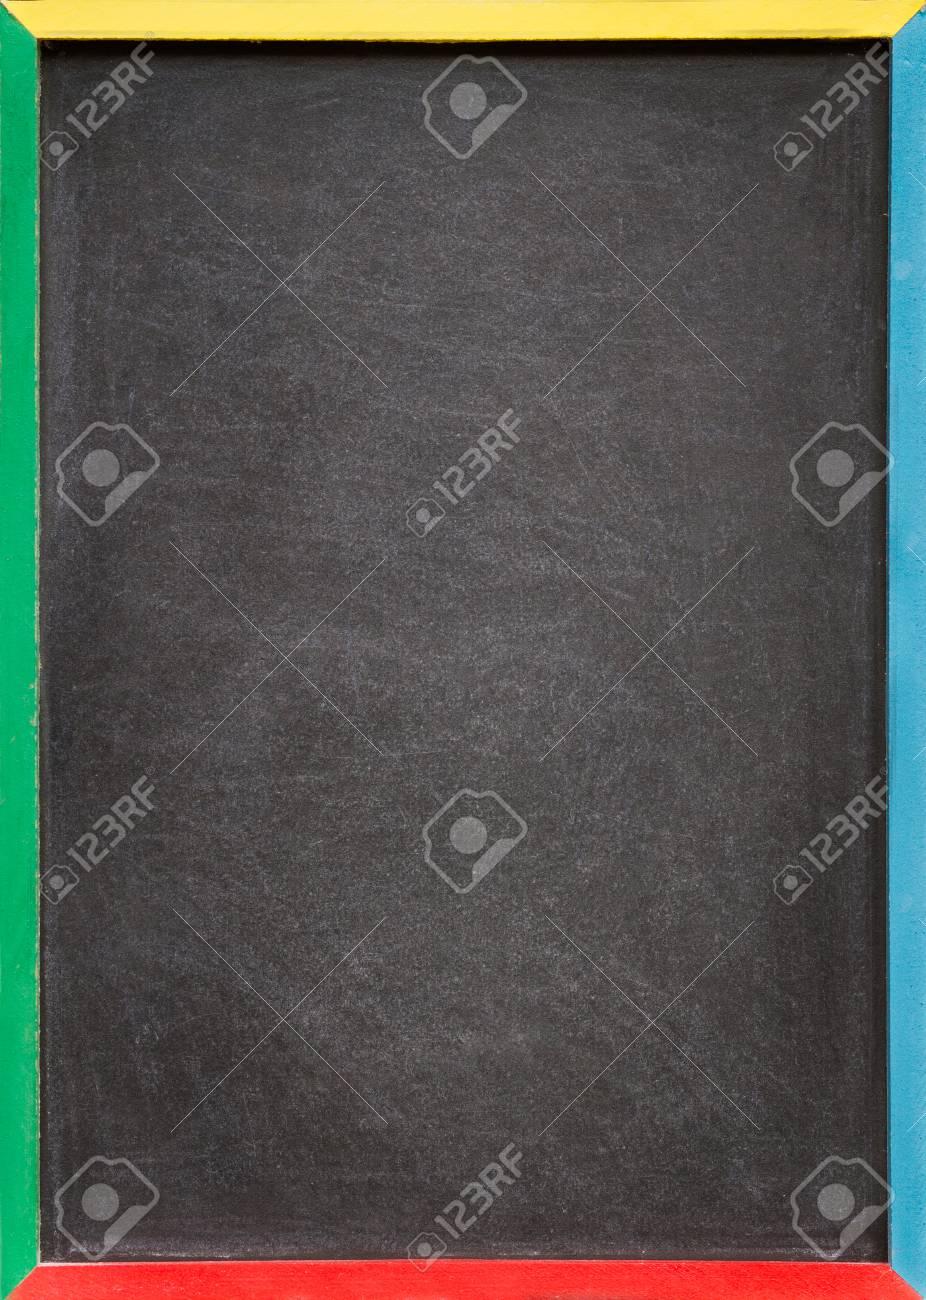 a blank slightly dirty chalkboard blackboard in a colourful old wooden frame stock photo